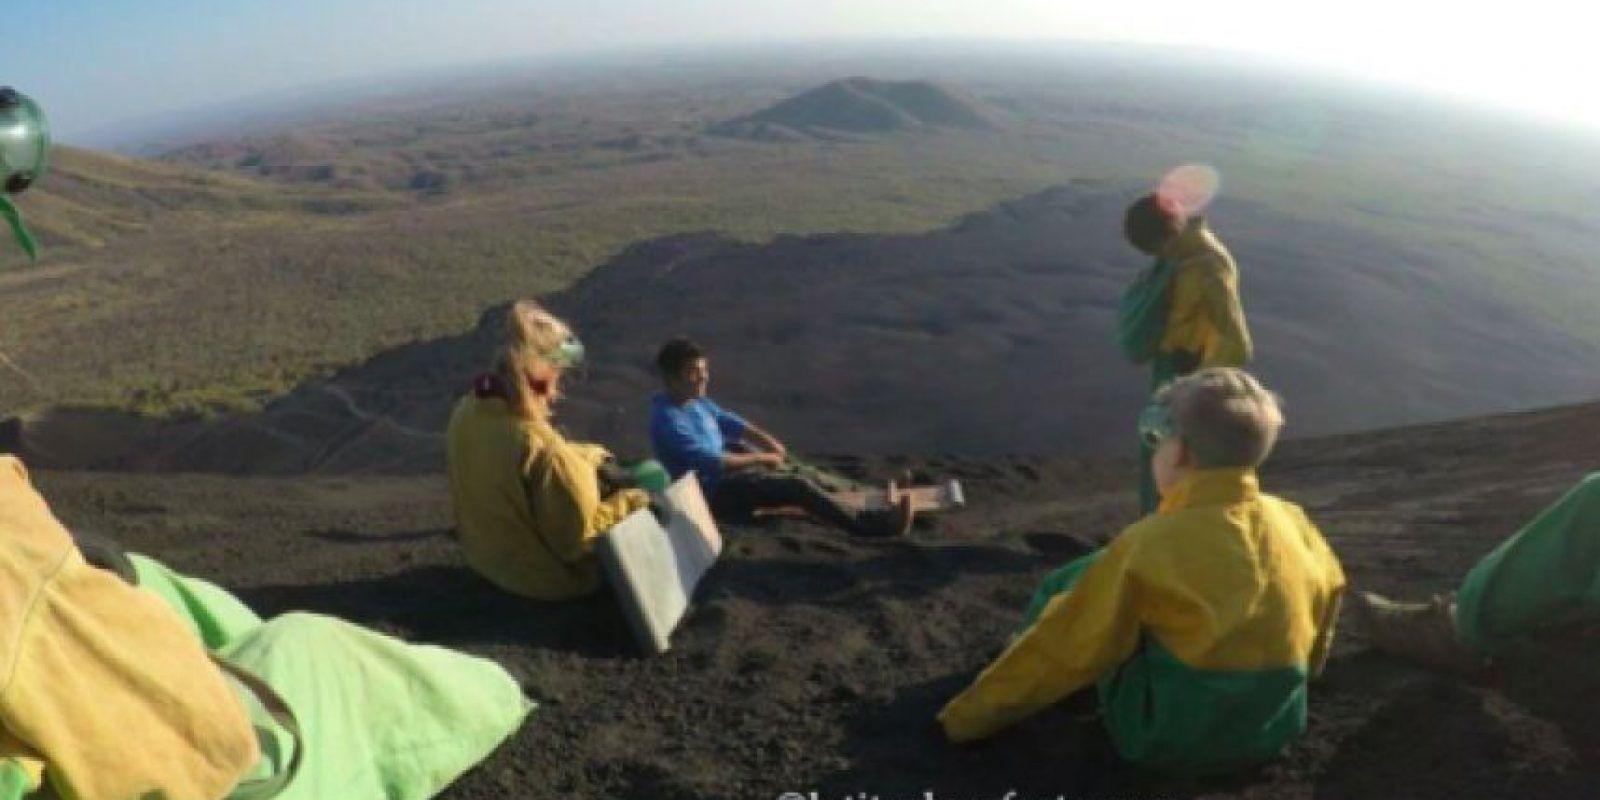 Volcán Cerro Negro, Nicaragua Foto:Latitud Perfecta. Imagen Por: